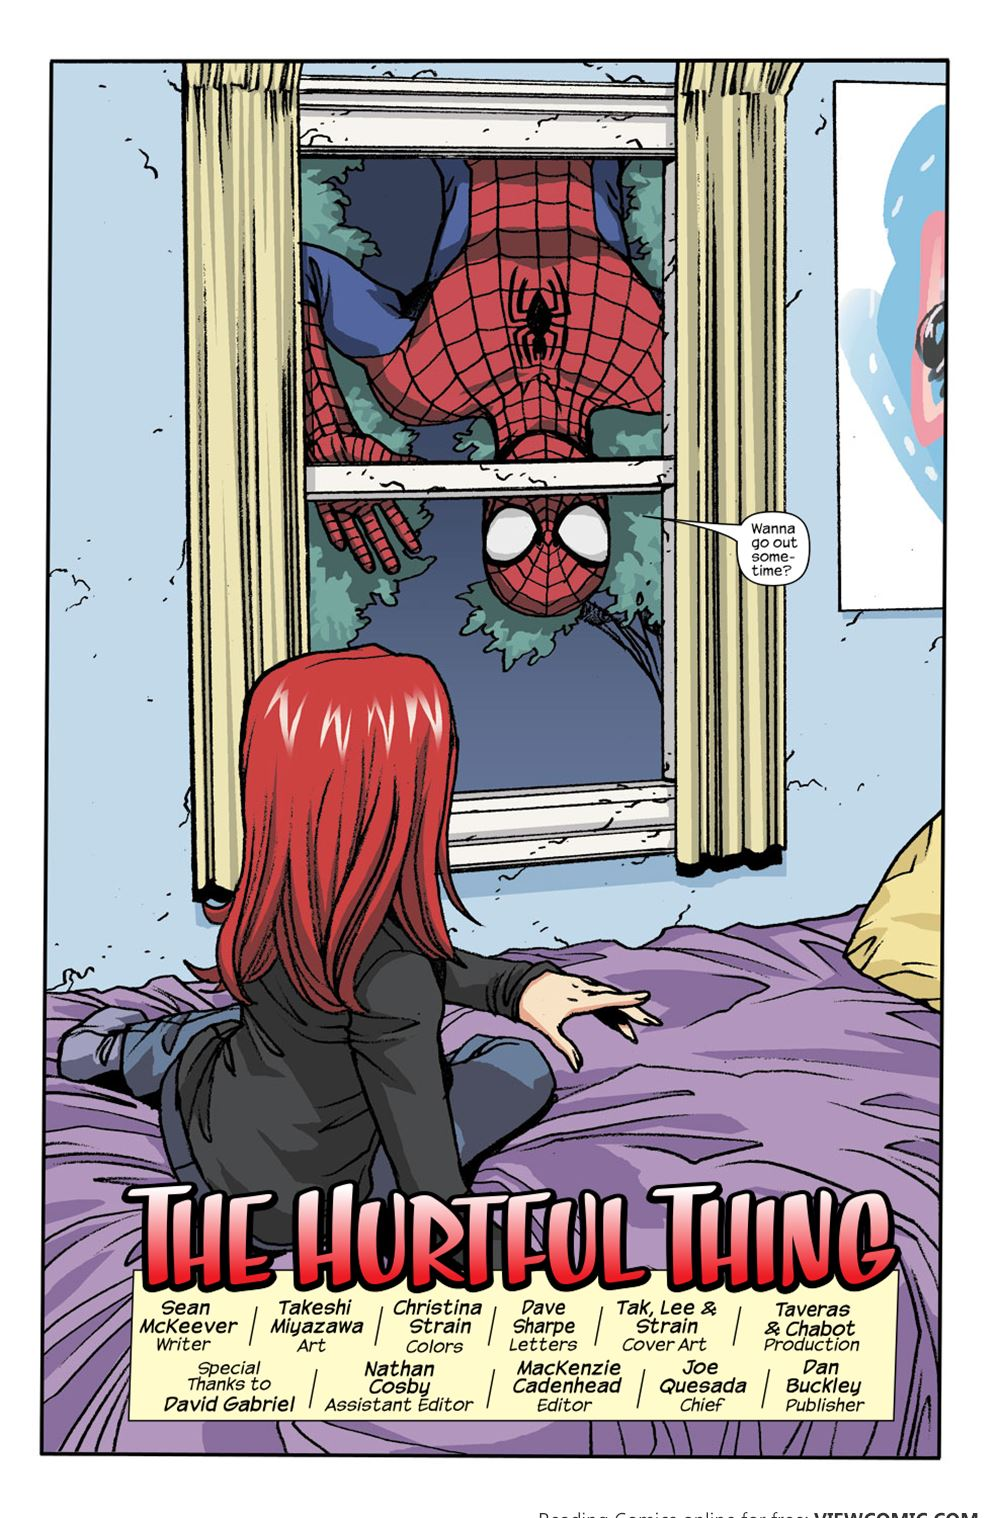 spiderman s Mary Jane körd